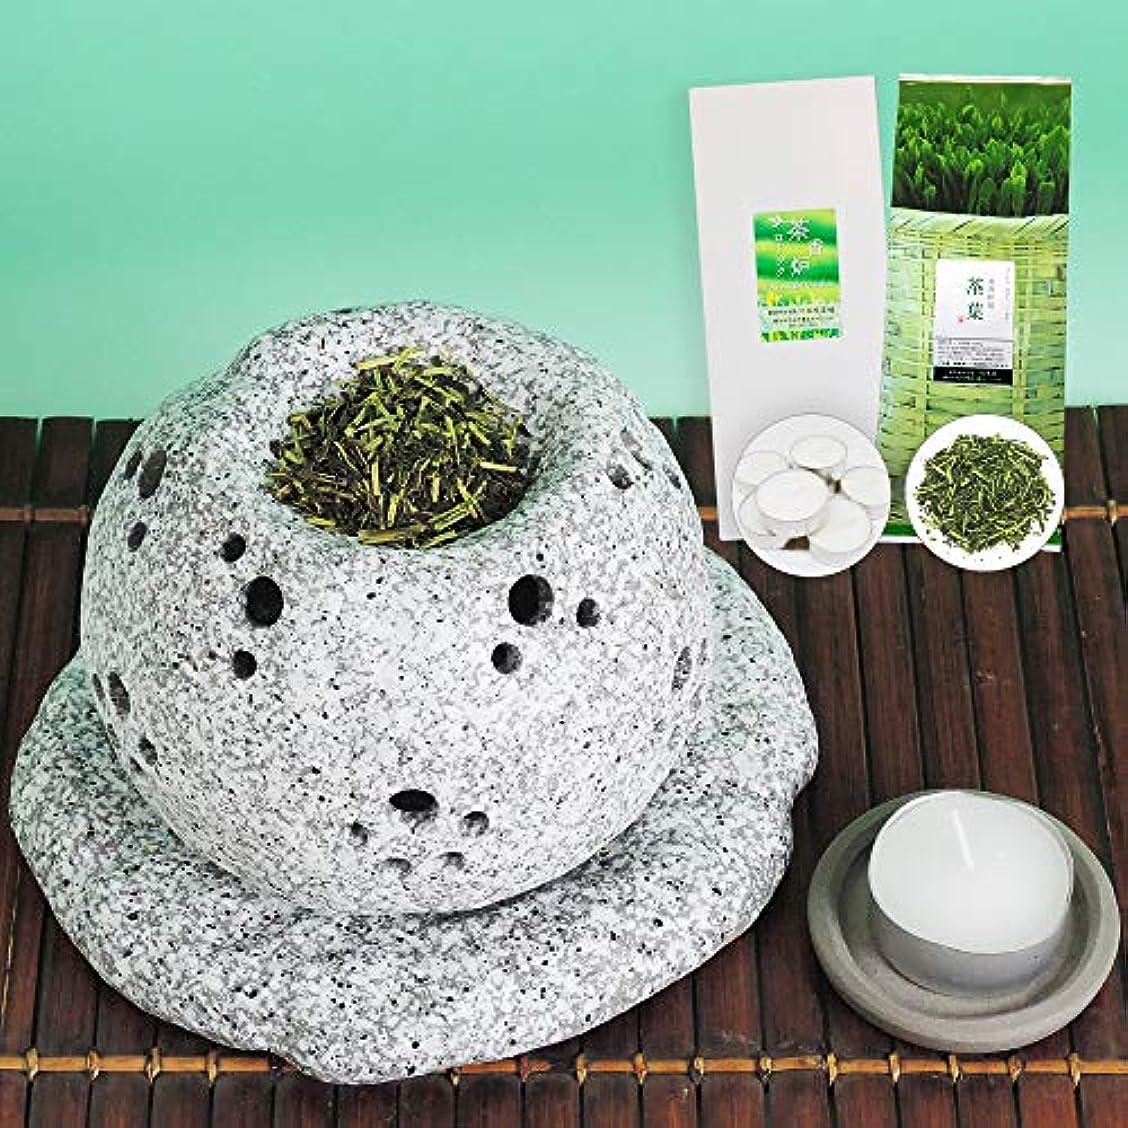 意義予算吹雪元祖 茶香炉セット 茶香炉専用茶葉&ローソク付 川本屋茶舗